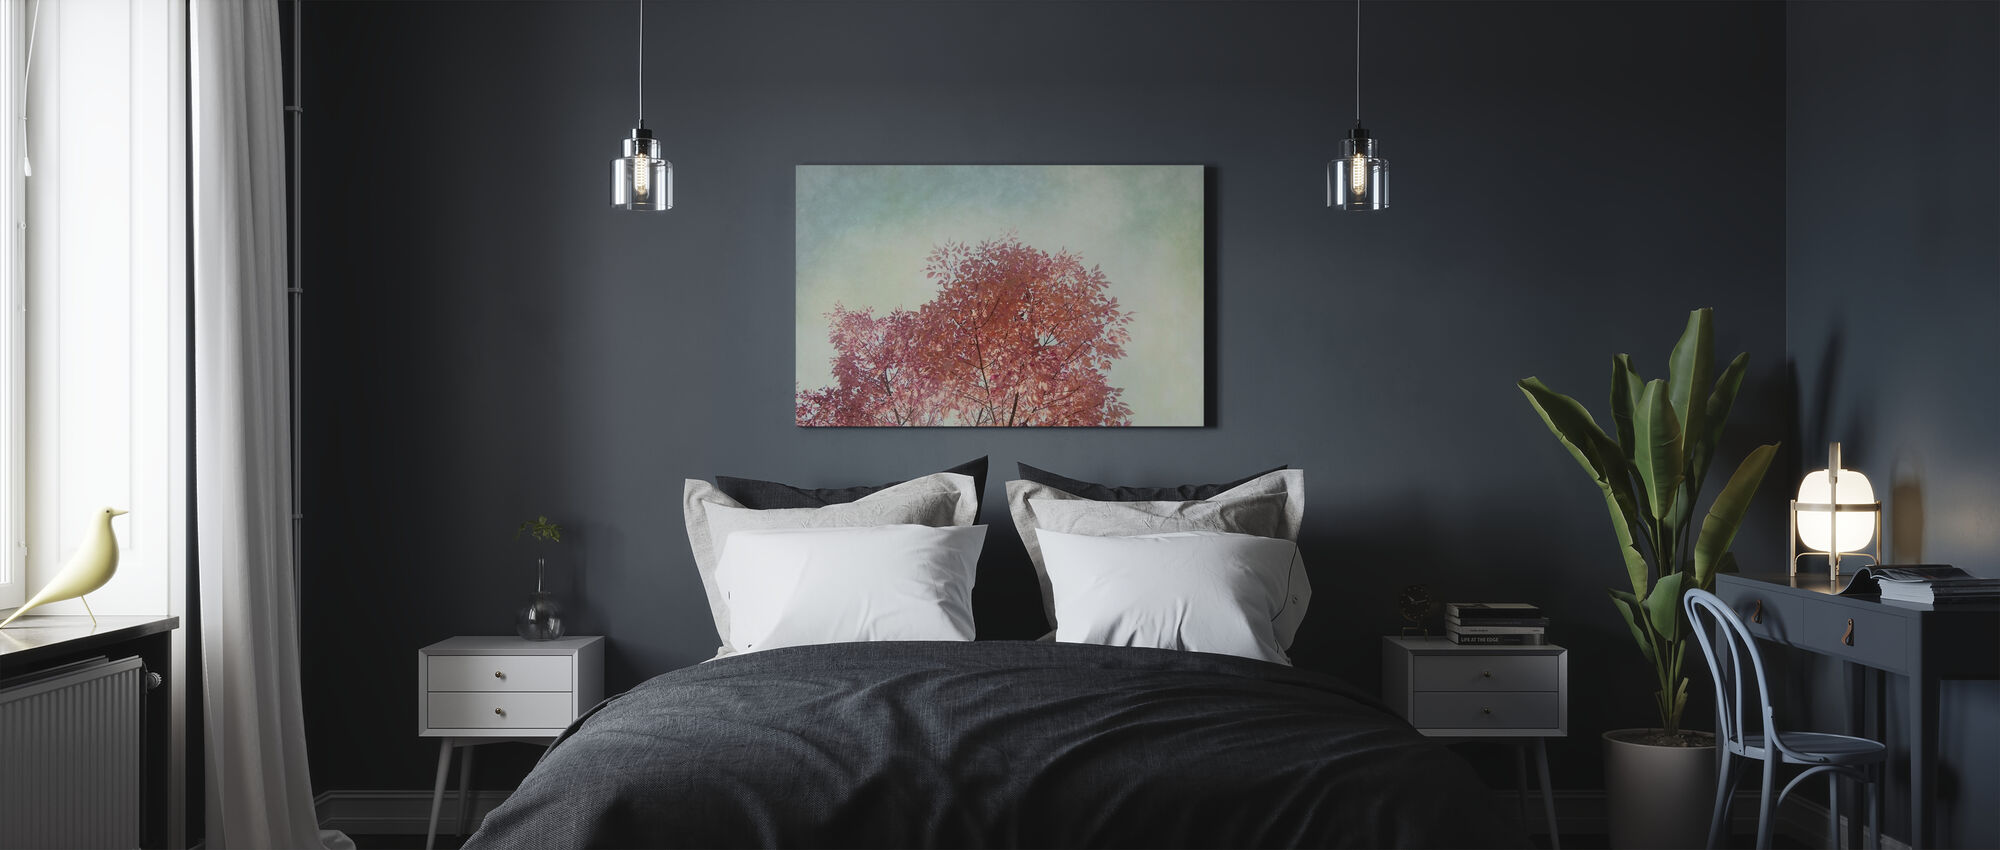 Looking Up 3 - Canvas print - Bedroom